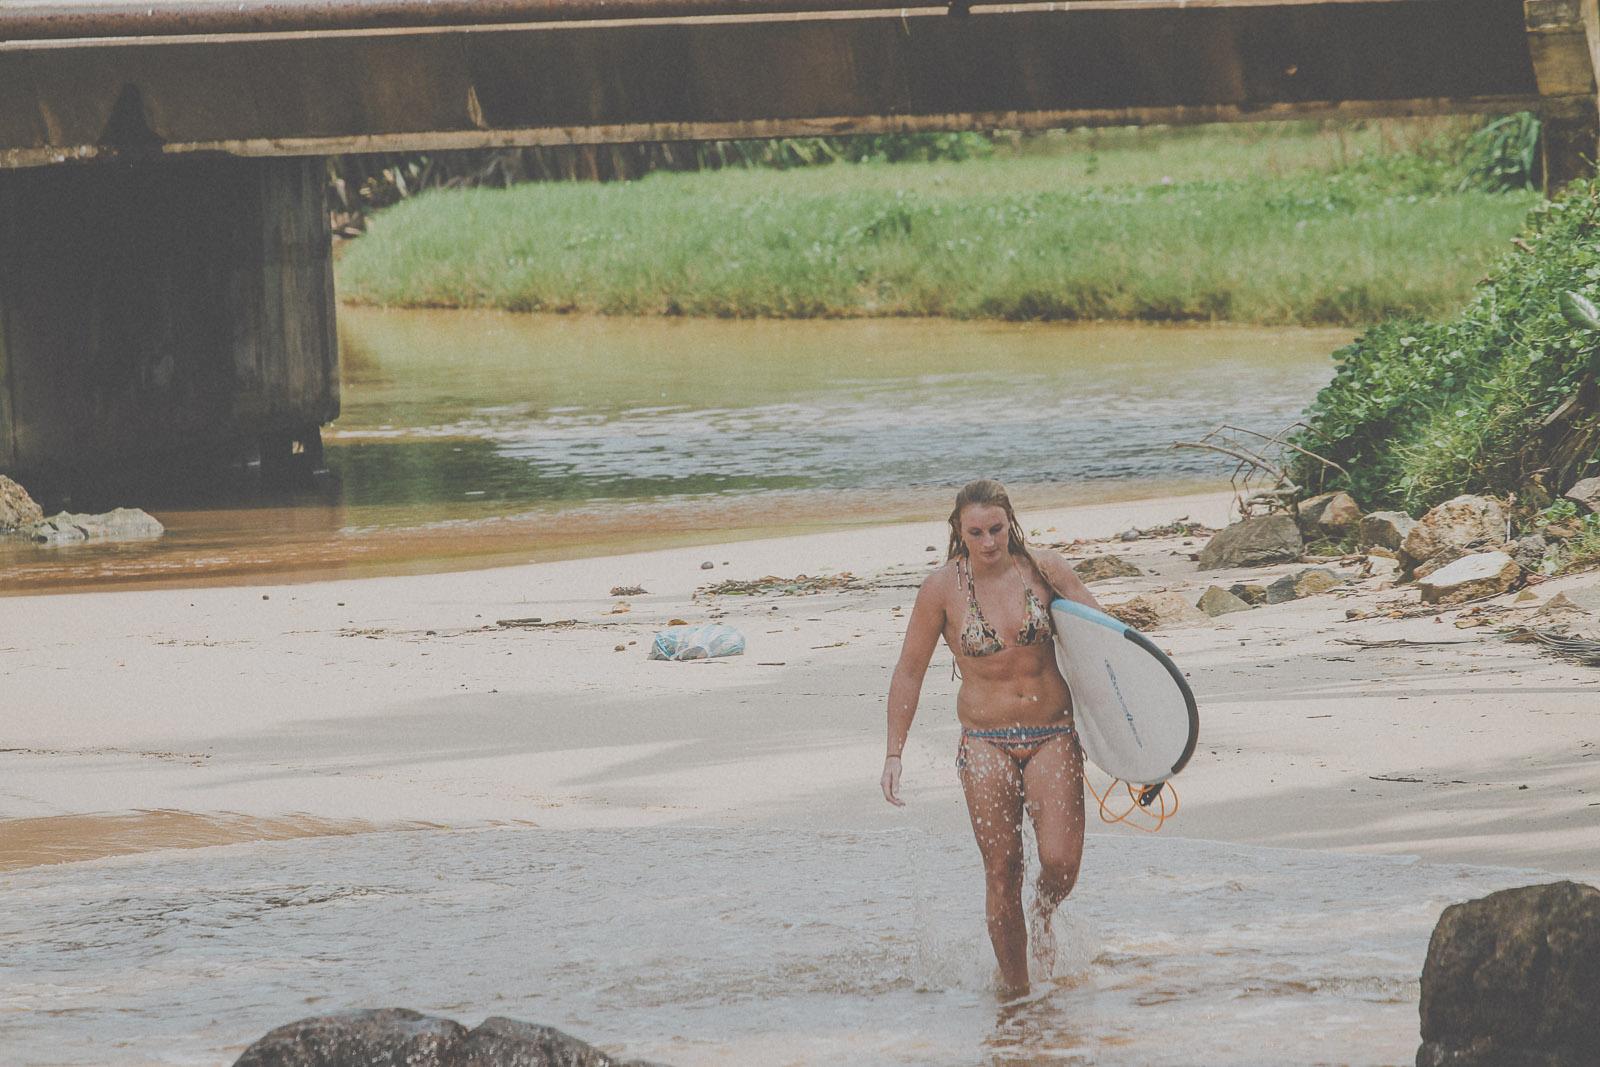 Sri Lanka-Hikkaduwa-Midigama-Aragum Bay-Sunshinestories-surf-travel-blog-IMG_4526